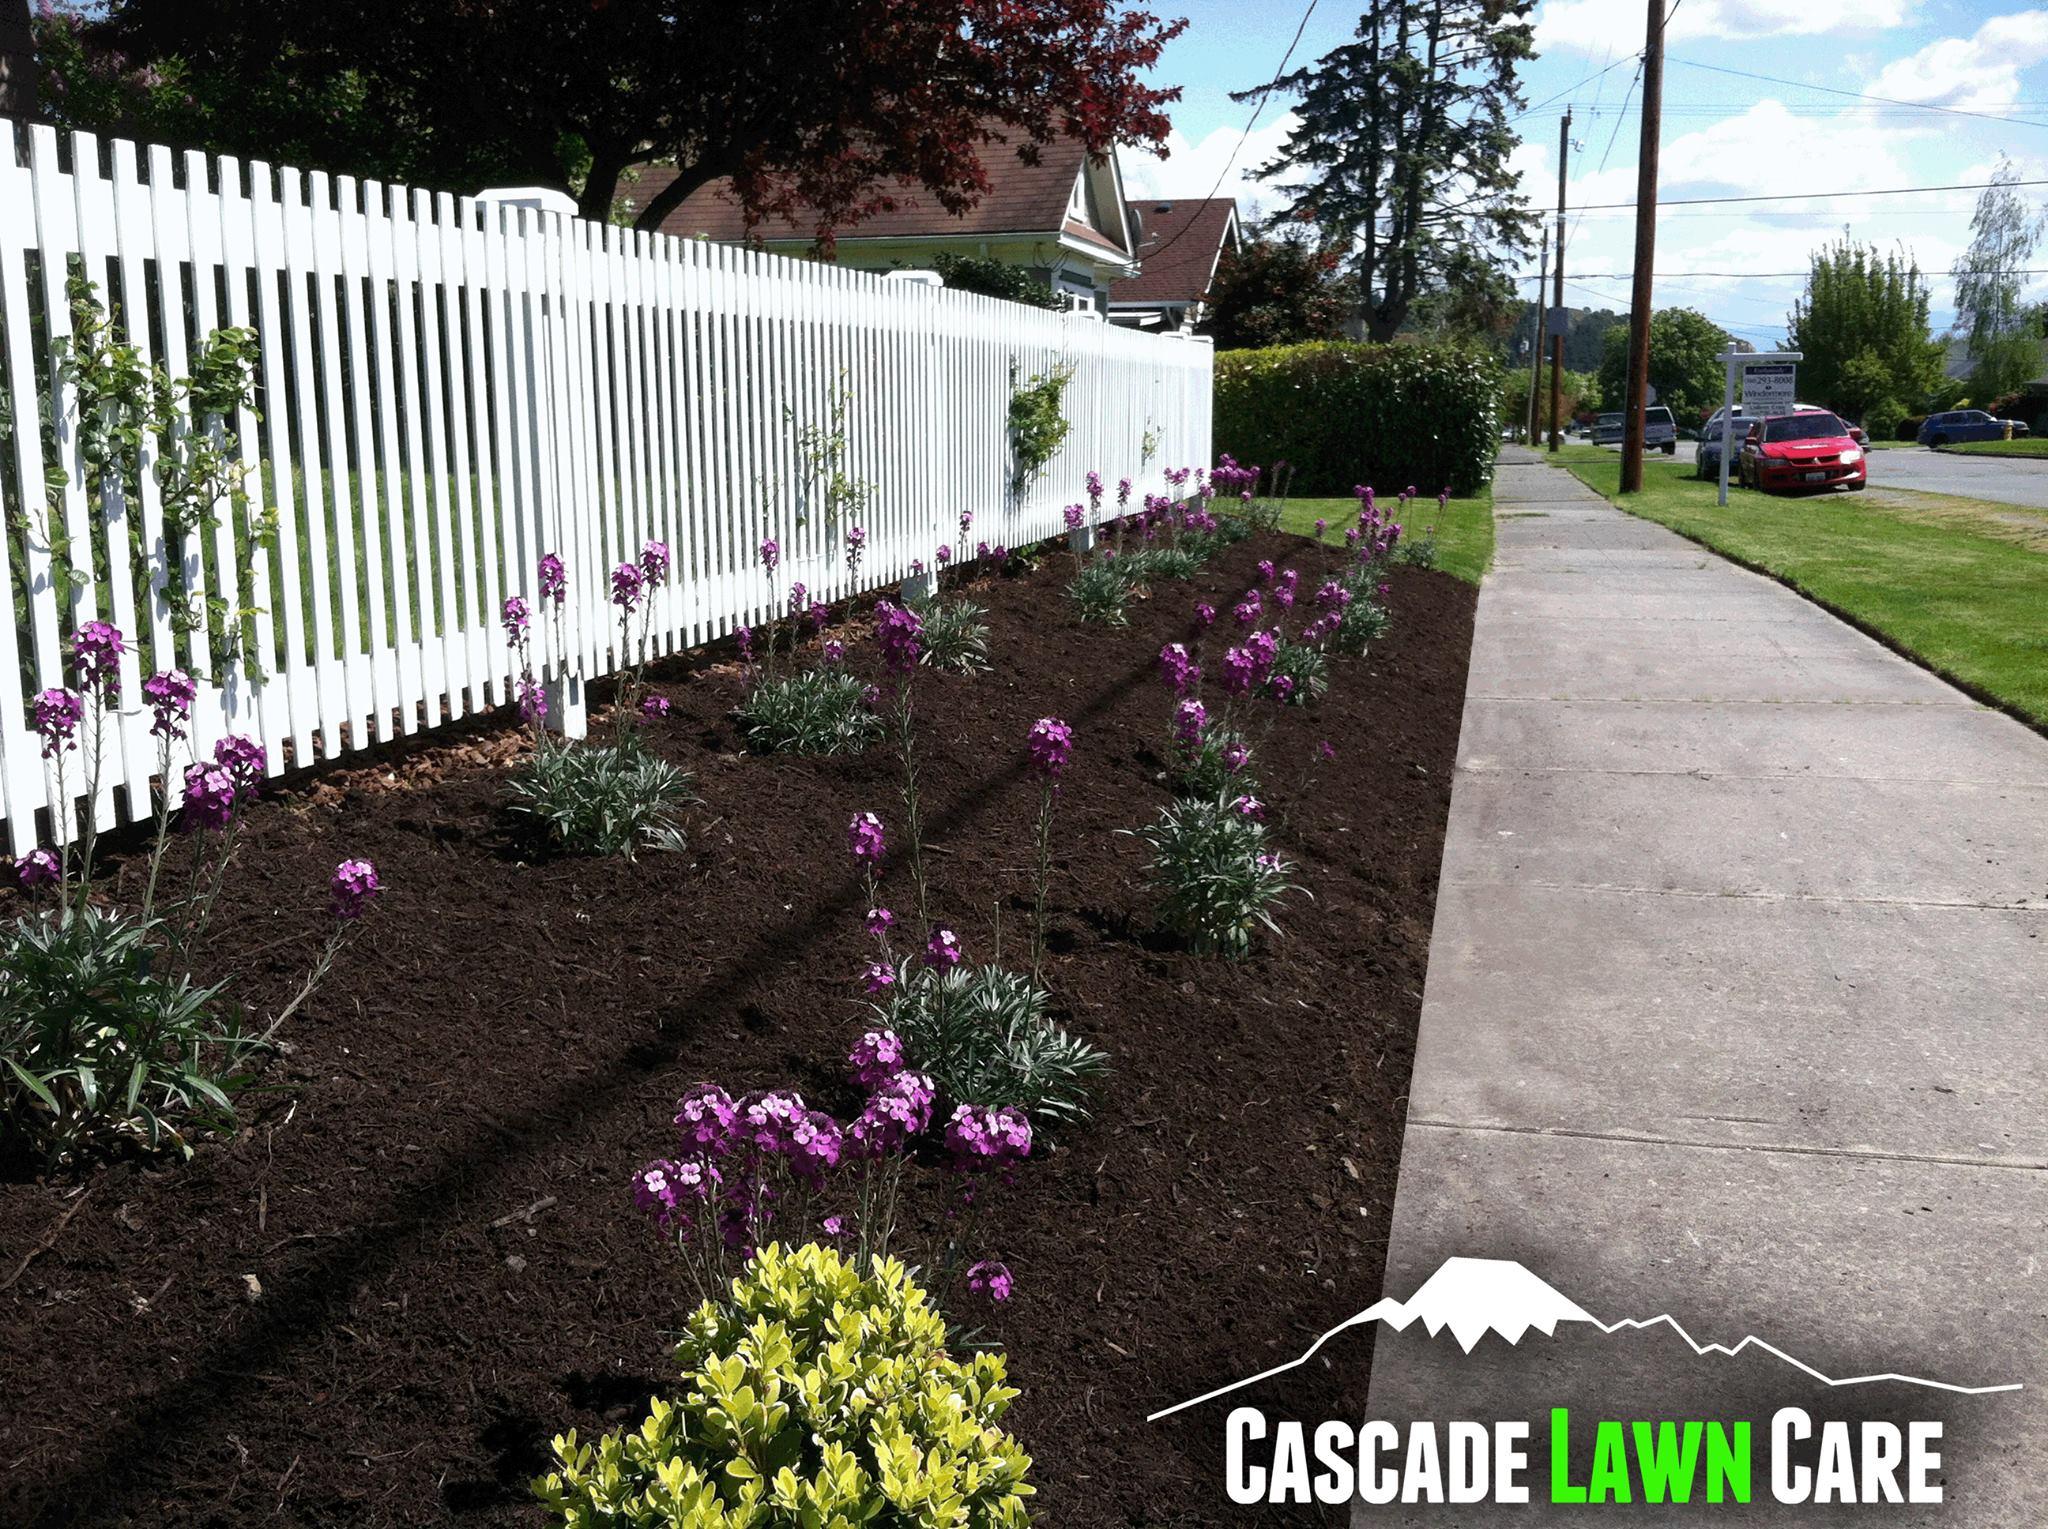 Unique Landscaping and Maintenance Services